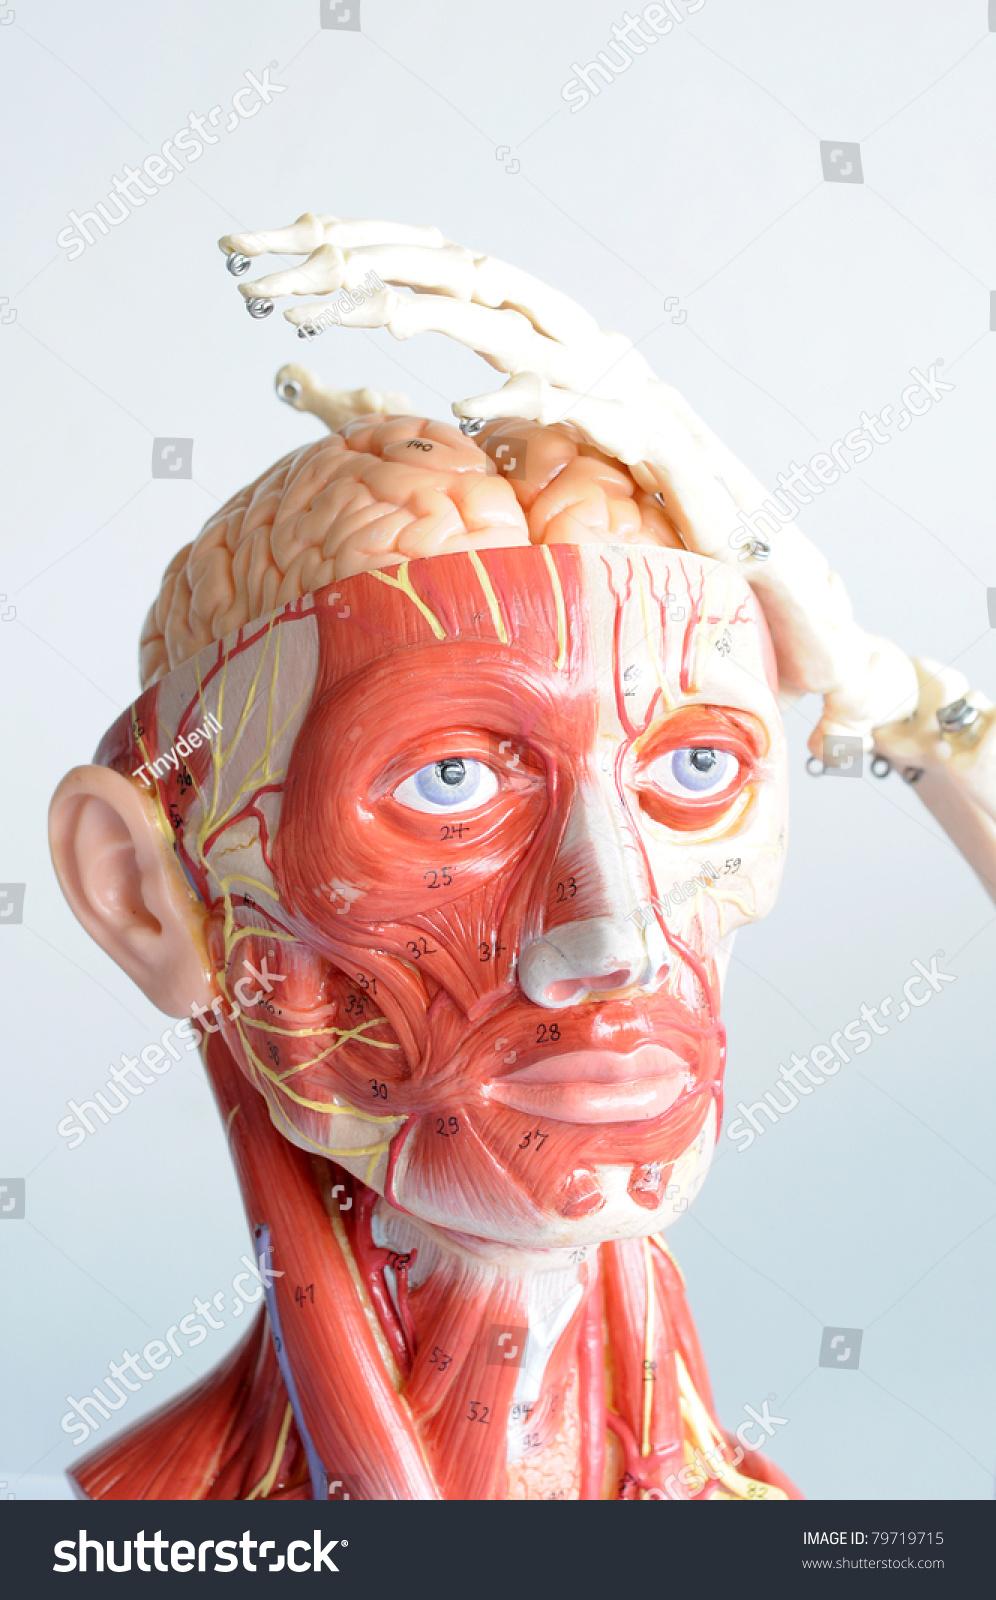 Head Anatomy Hand Bone Stock Photo & Image (Royalty-Free) 79719715 ...